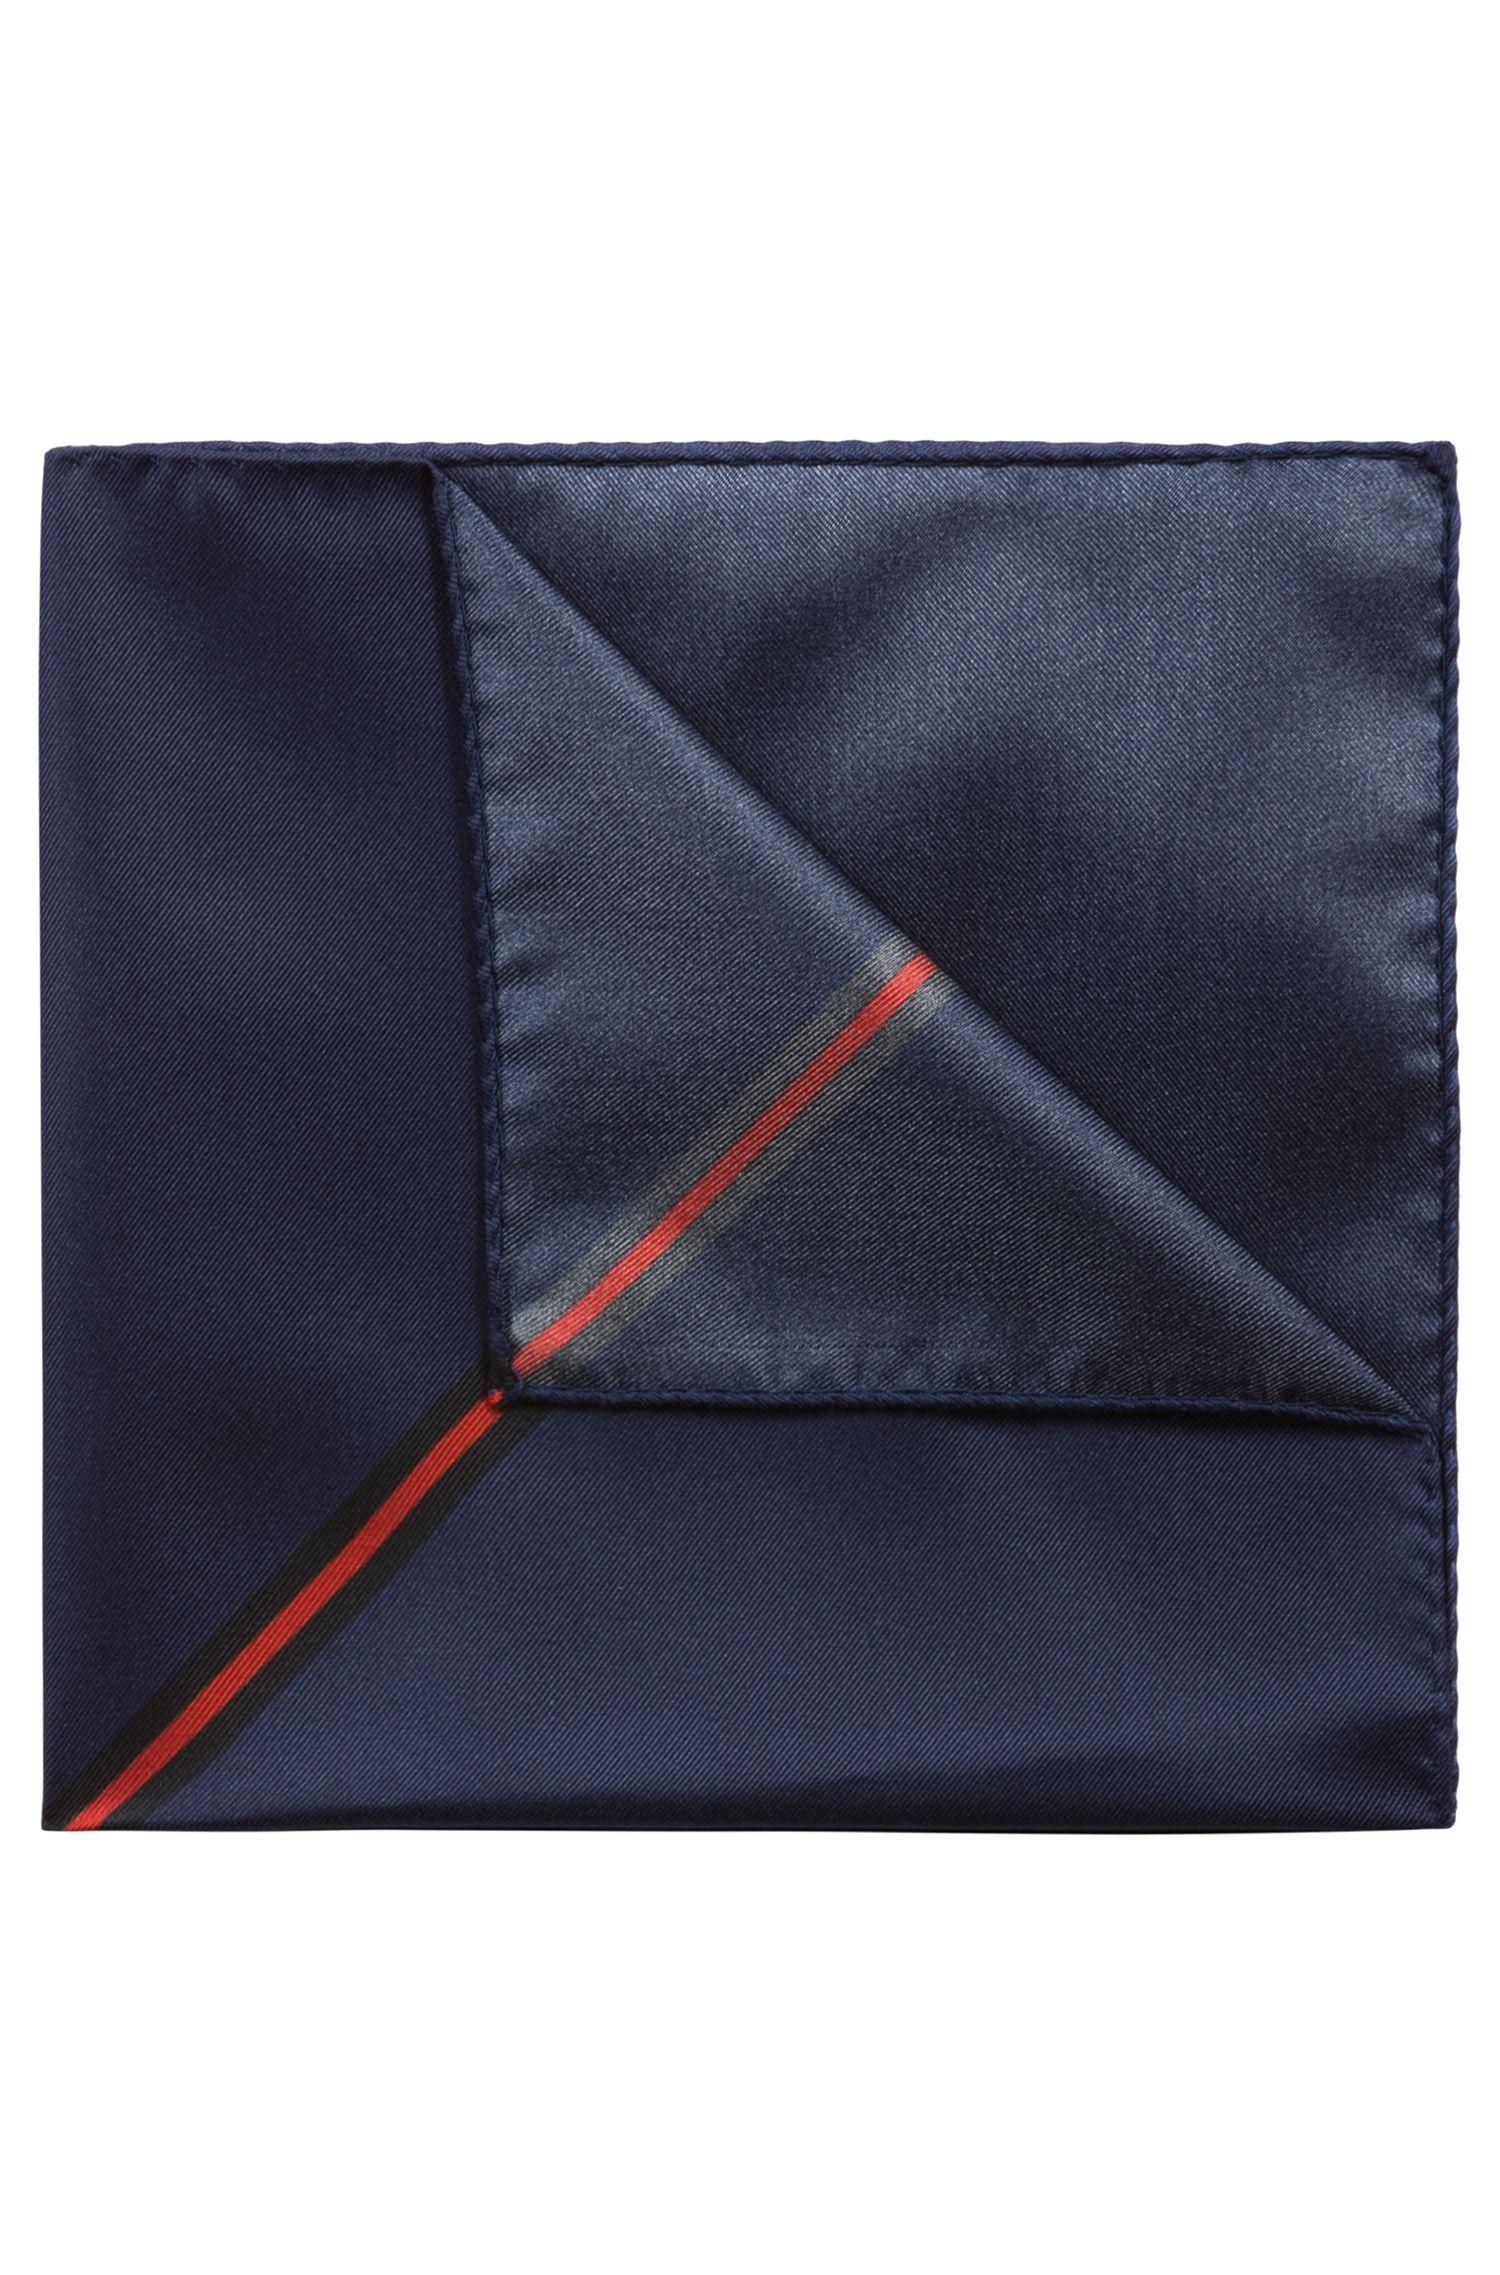 Hugo Boss - Pañuelo de bolsillo en sarga de seda con estampado digital - 1